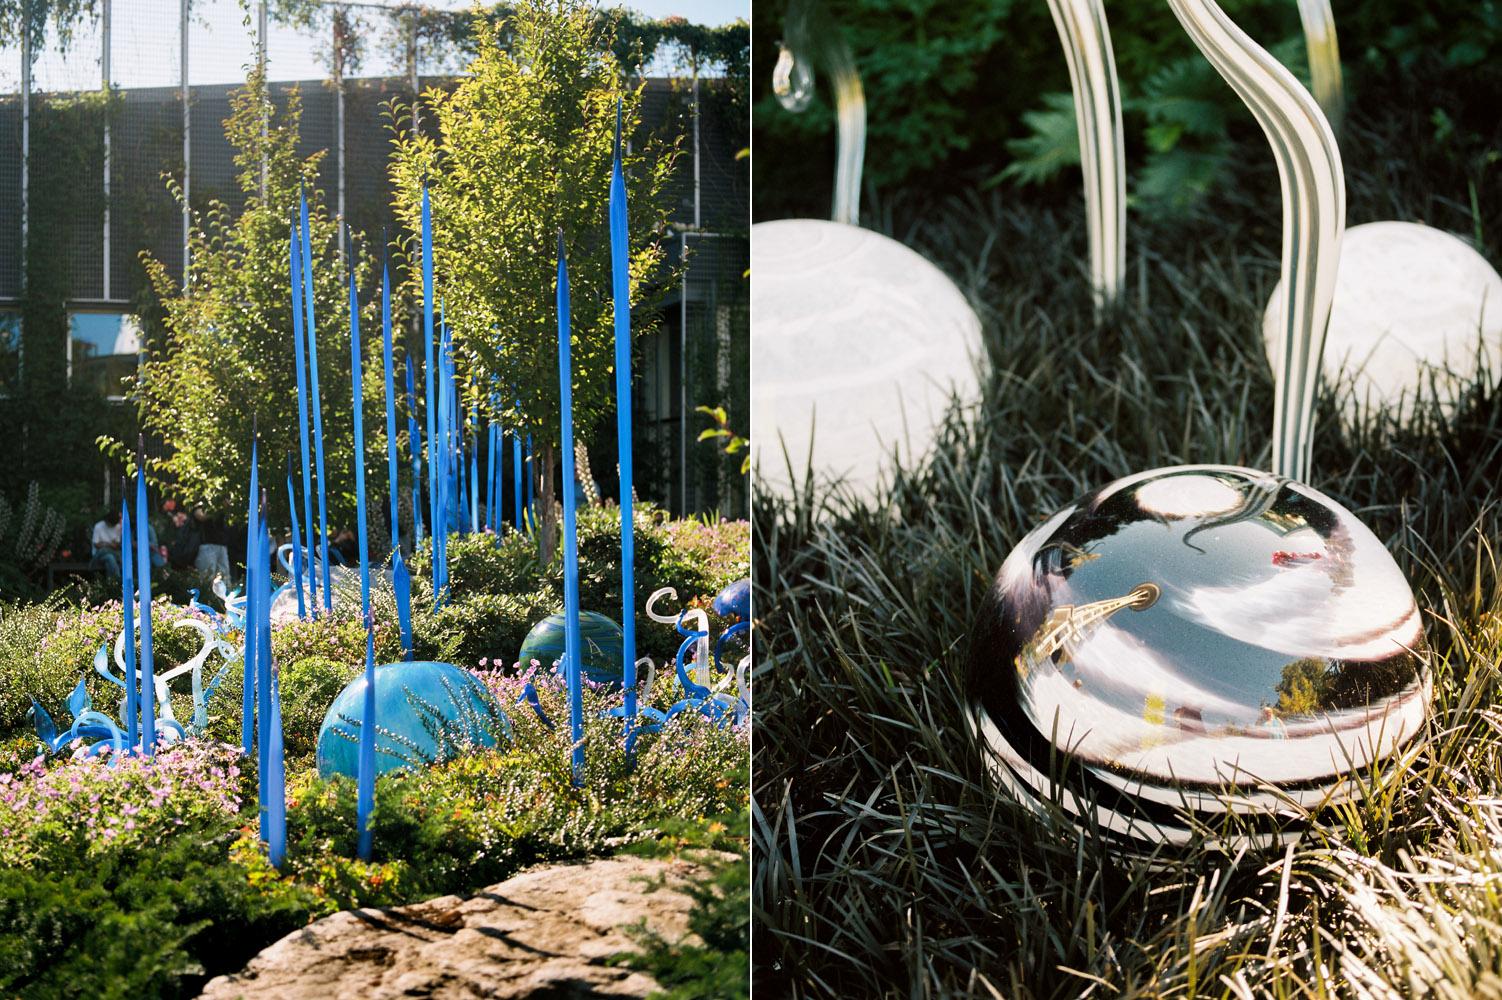 chihuly garden of glass 8.jpg